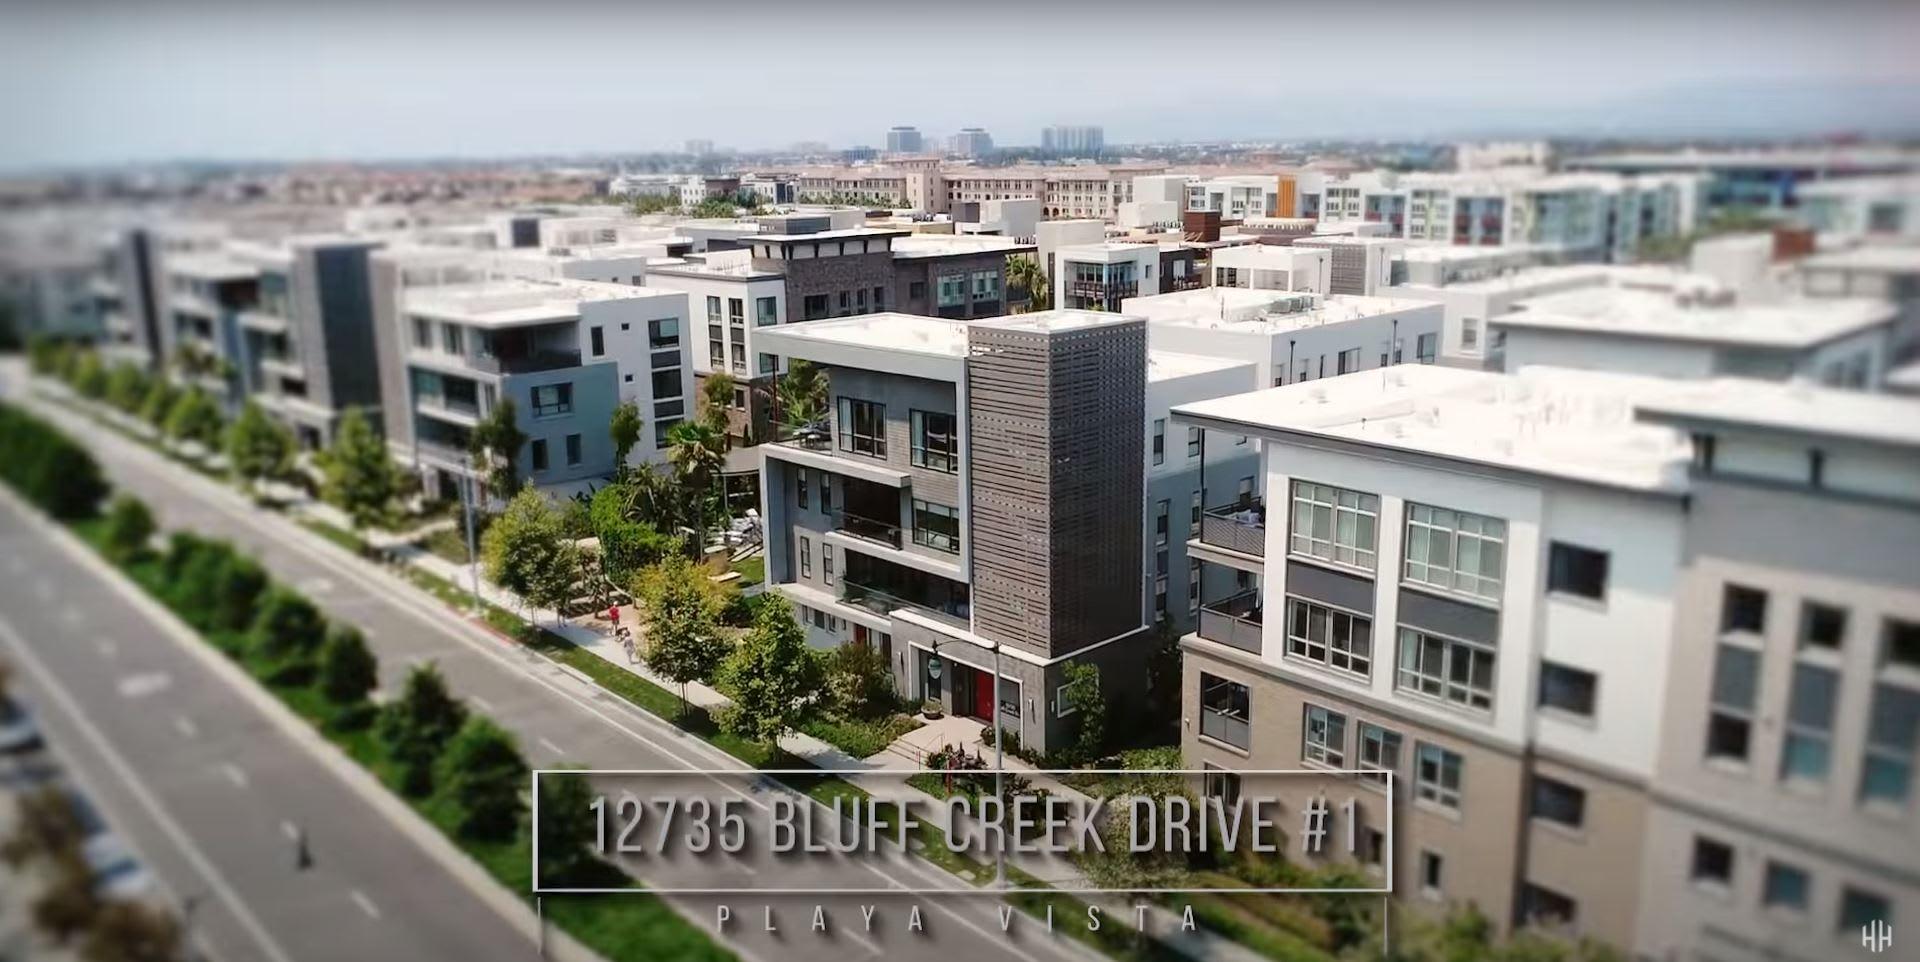 12735 Bluff Creek Drive #1 | Playa Vista video preview